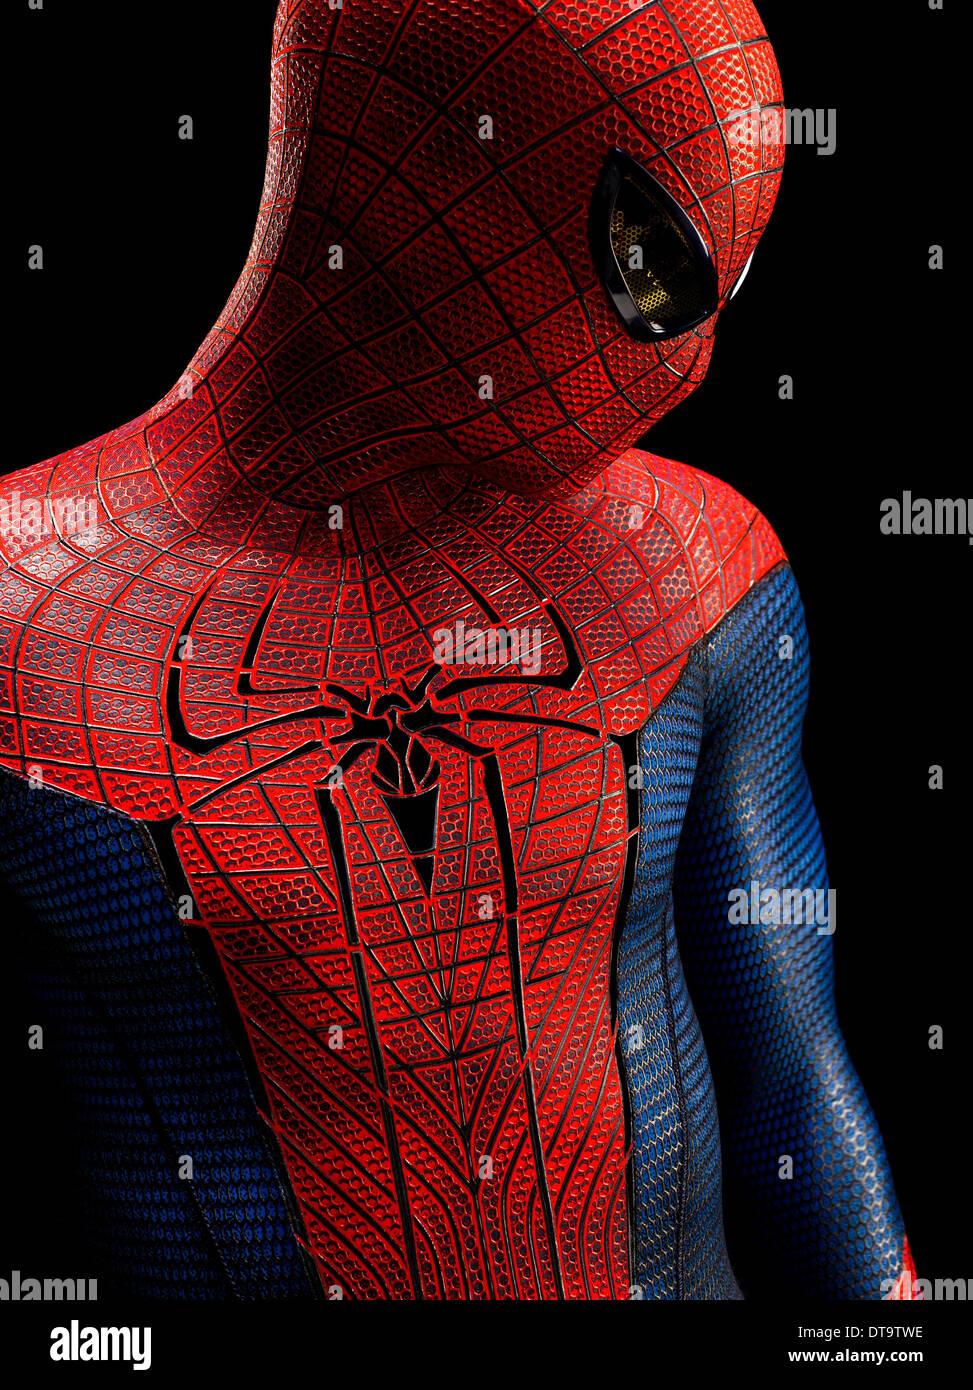 Andrew Garfield The Amazing Spider Man Spiderman Spider Man 2012 Stock Photo Alamy